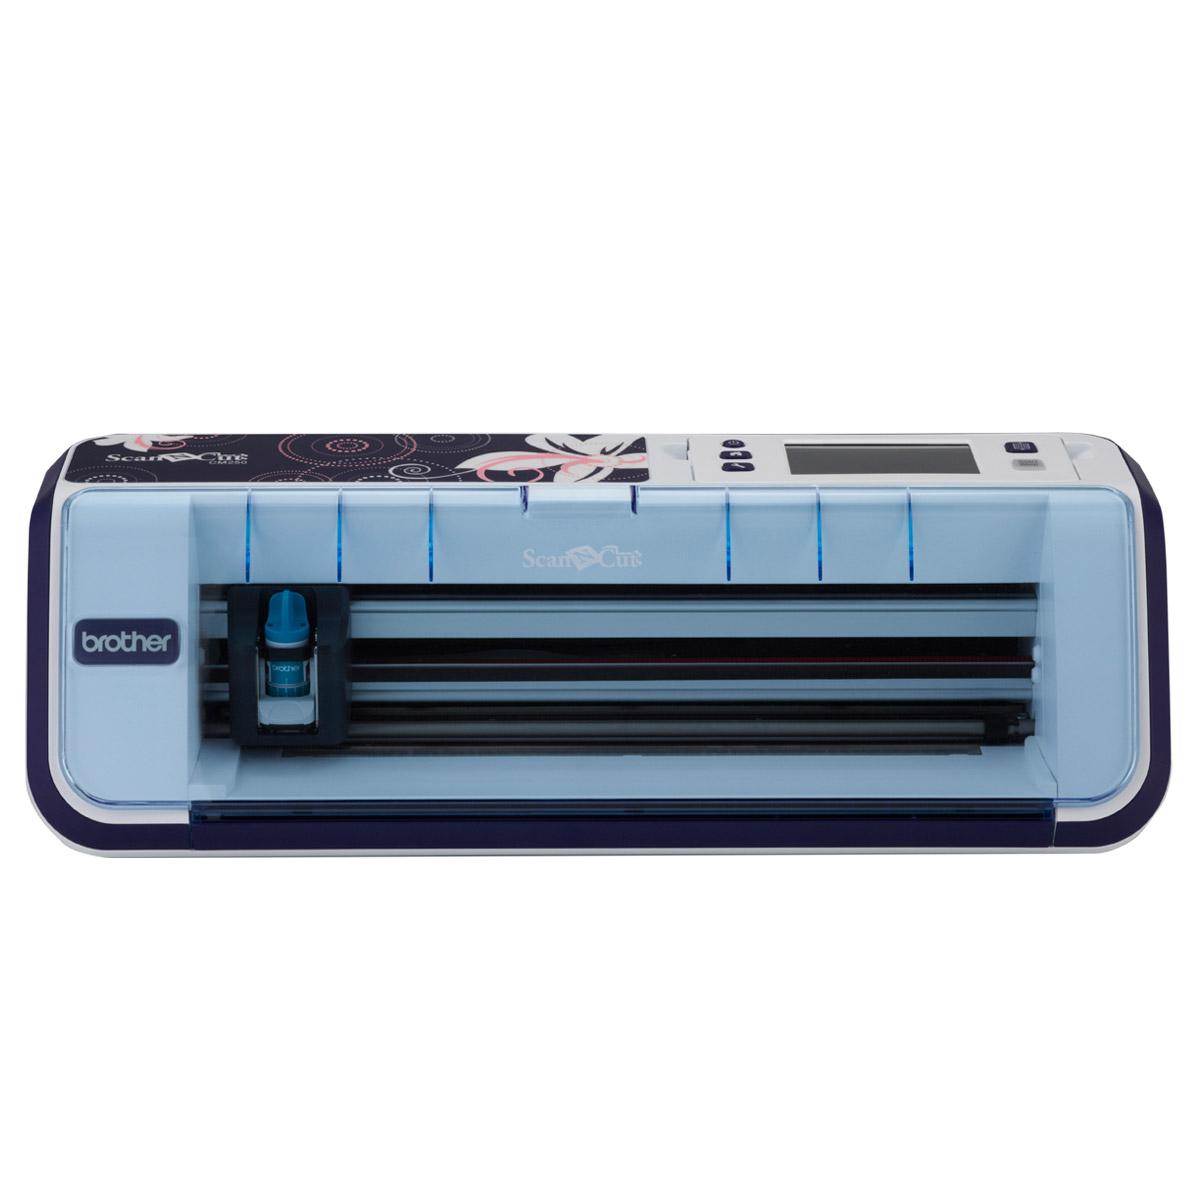 cm250 cutting machine with scanner